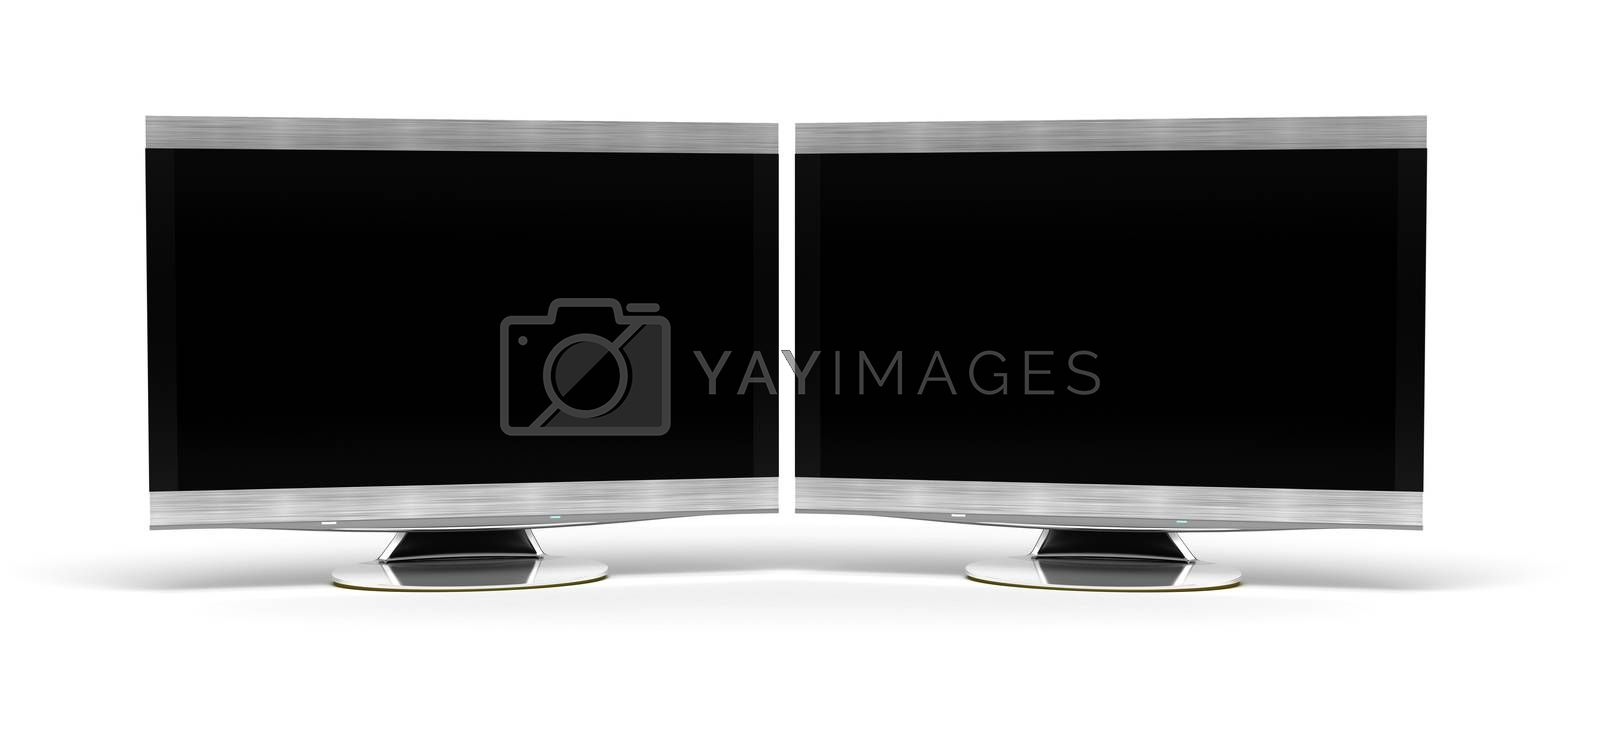 Two HD Display